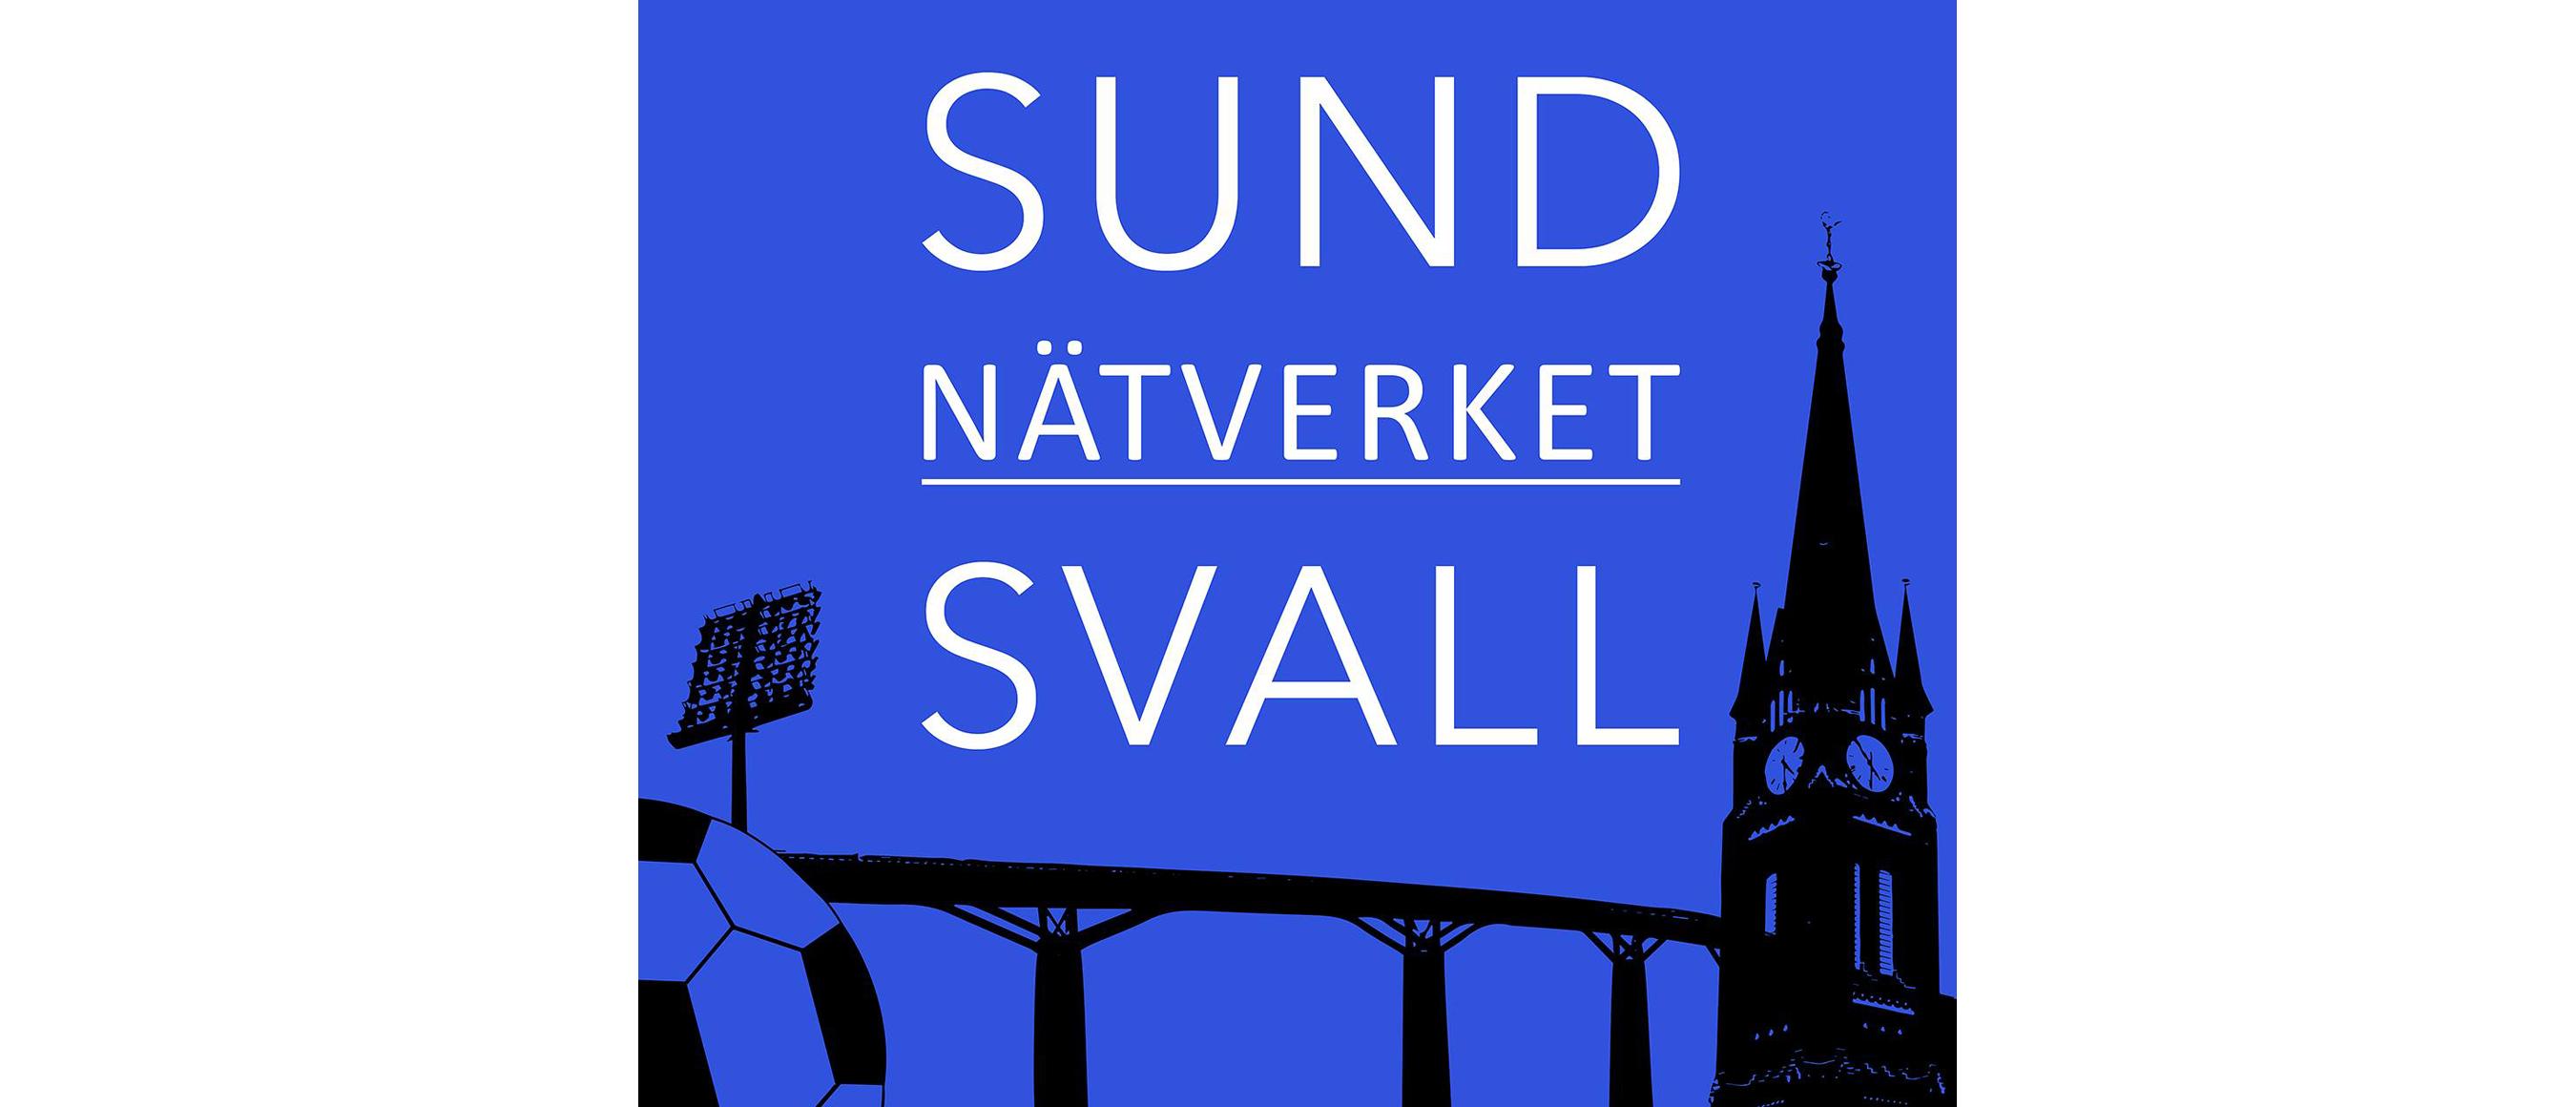 Nätverket Sundsvall